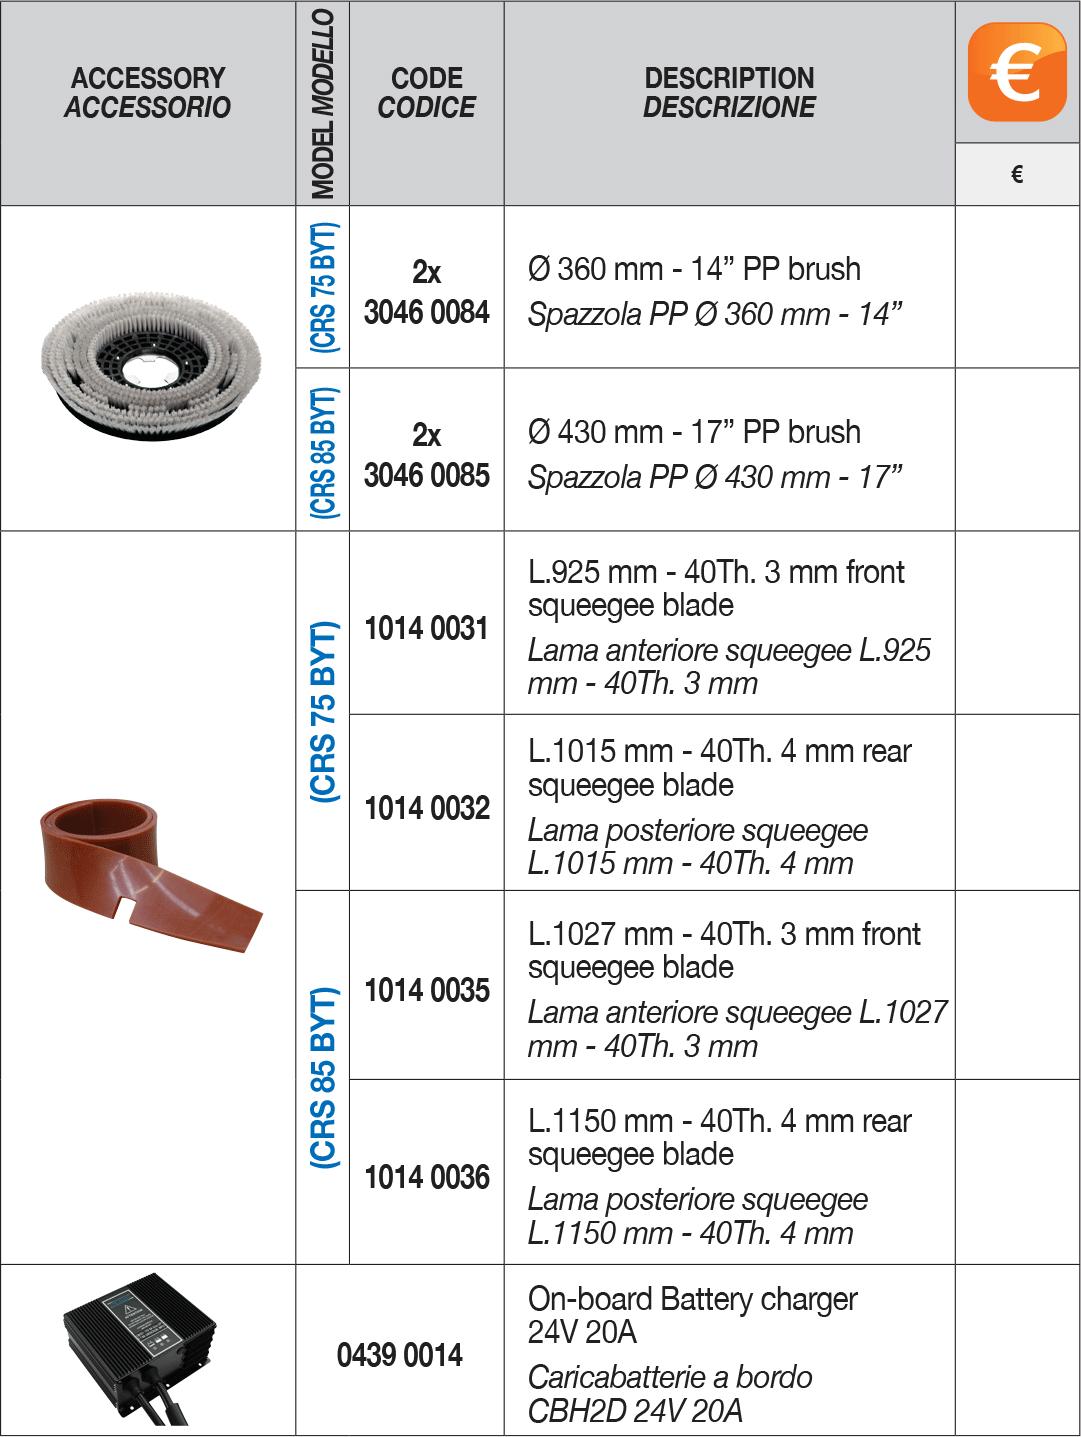 crs 75 85 byt standard accessories Comet